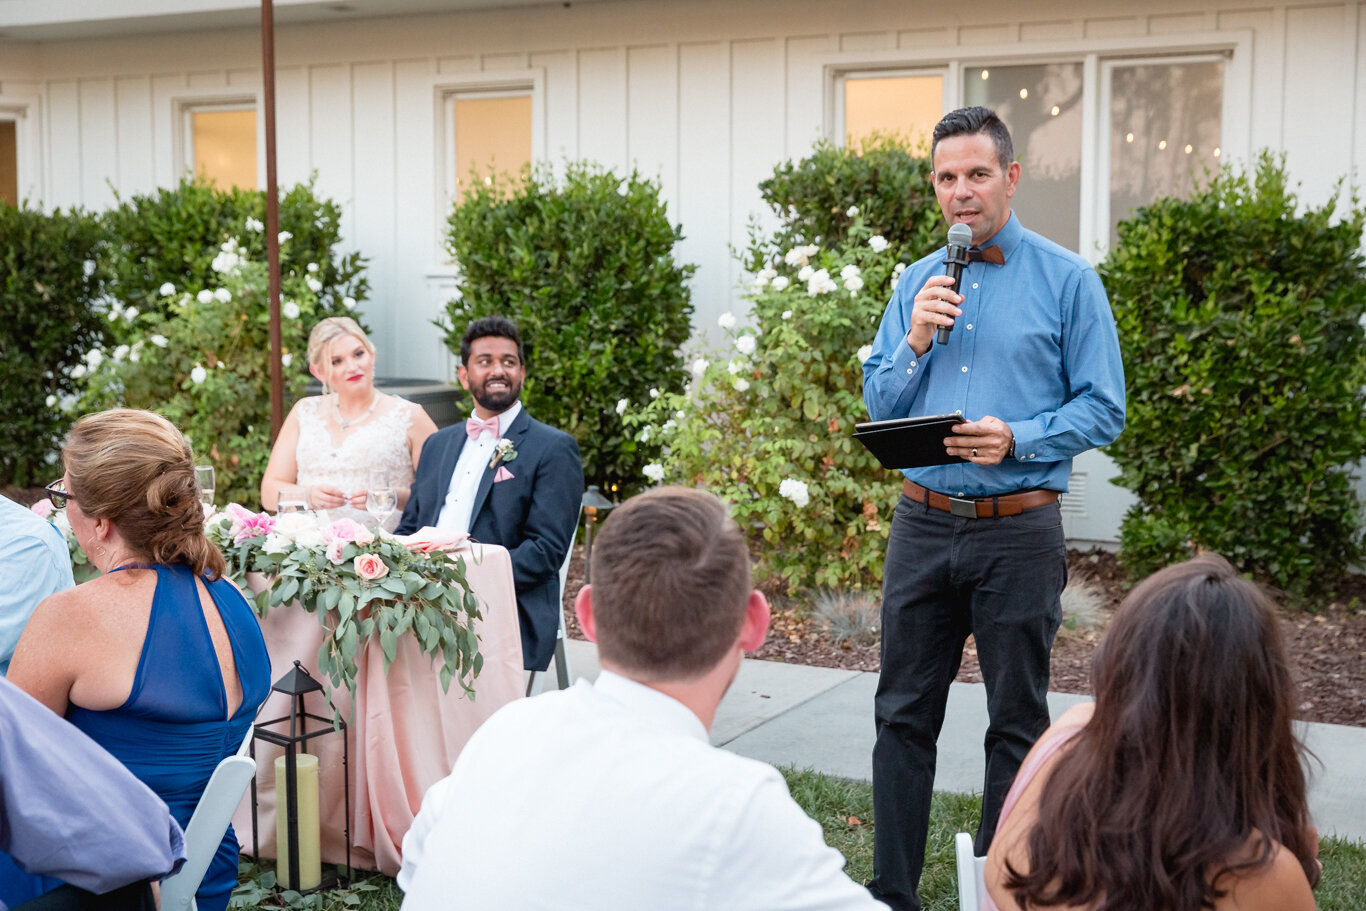 2019.08.24_Emily-Ashir-Wedding-at-the-Maples-6311.jpg